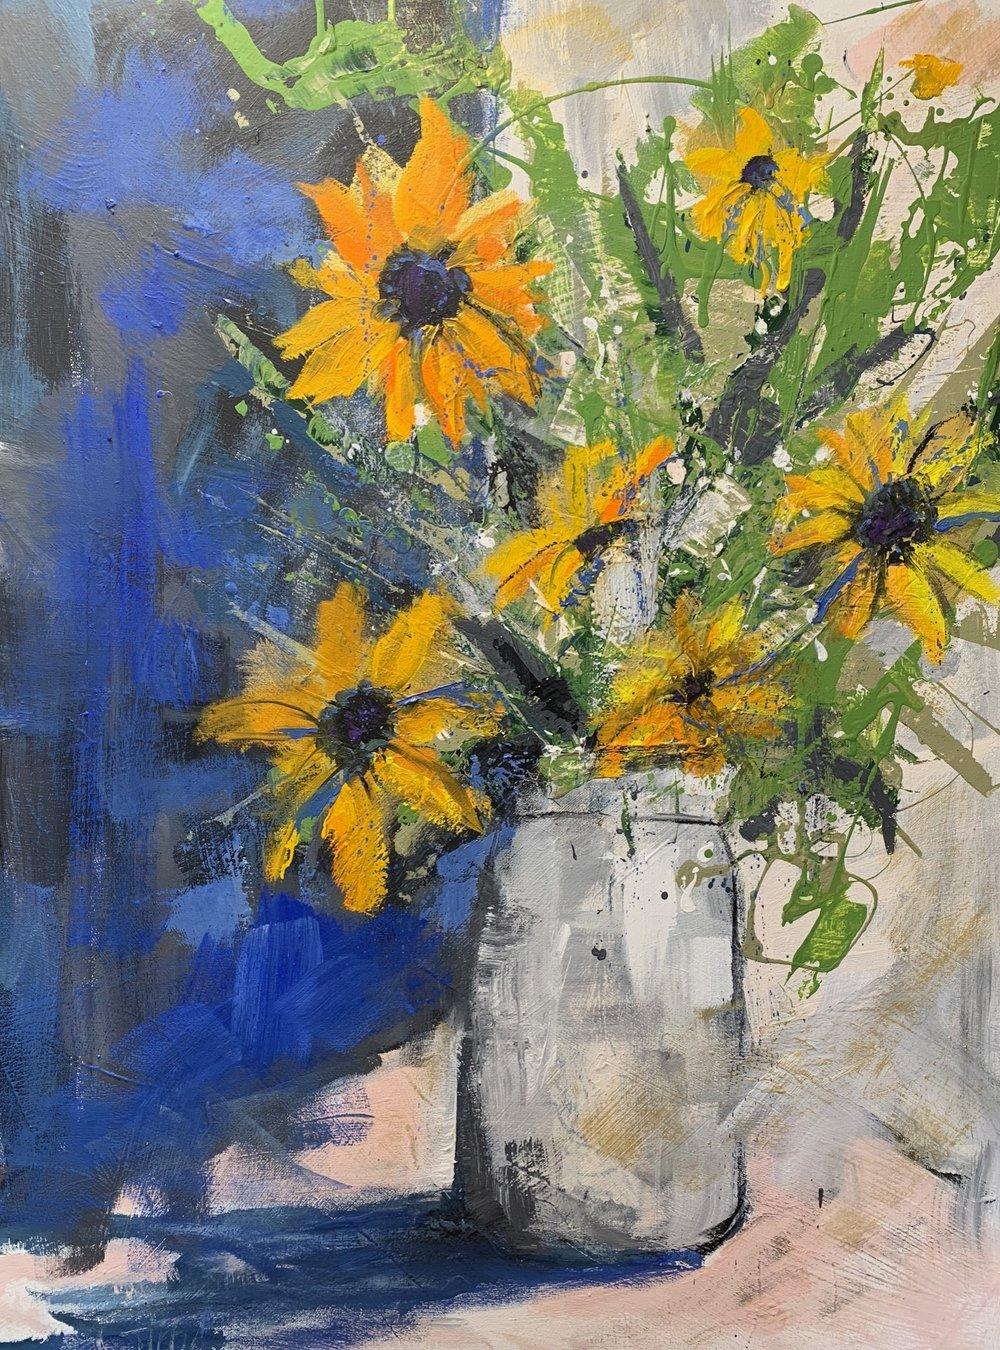 """Flower Power"", Oil on Canvas, 40 x 30"